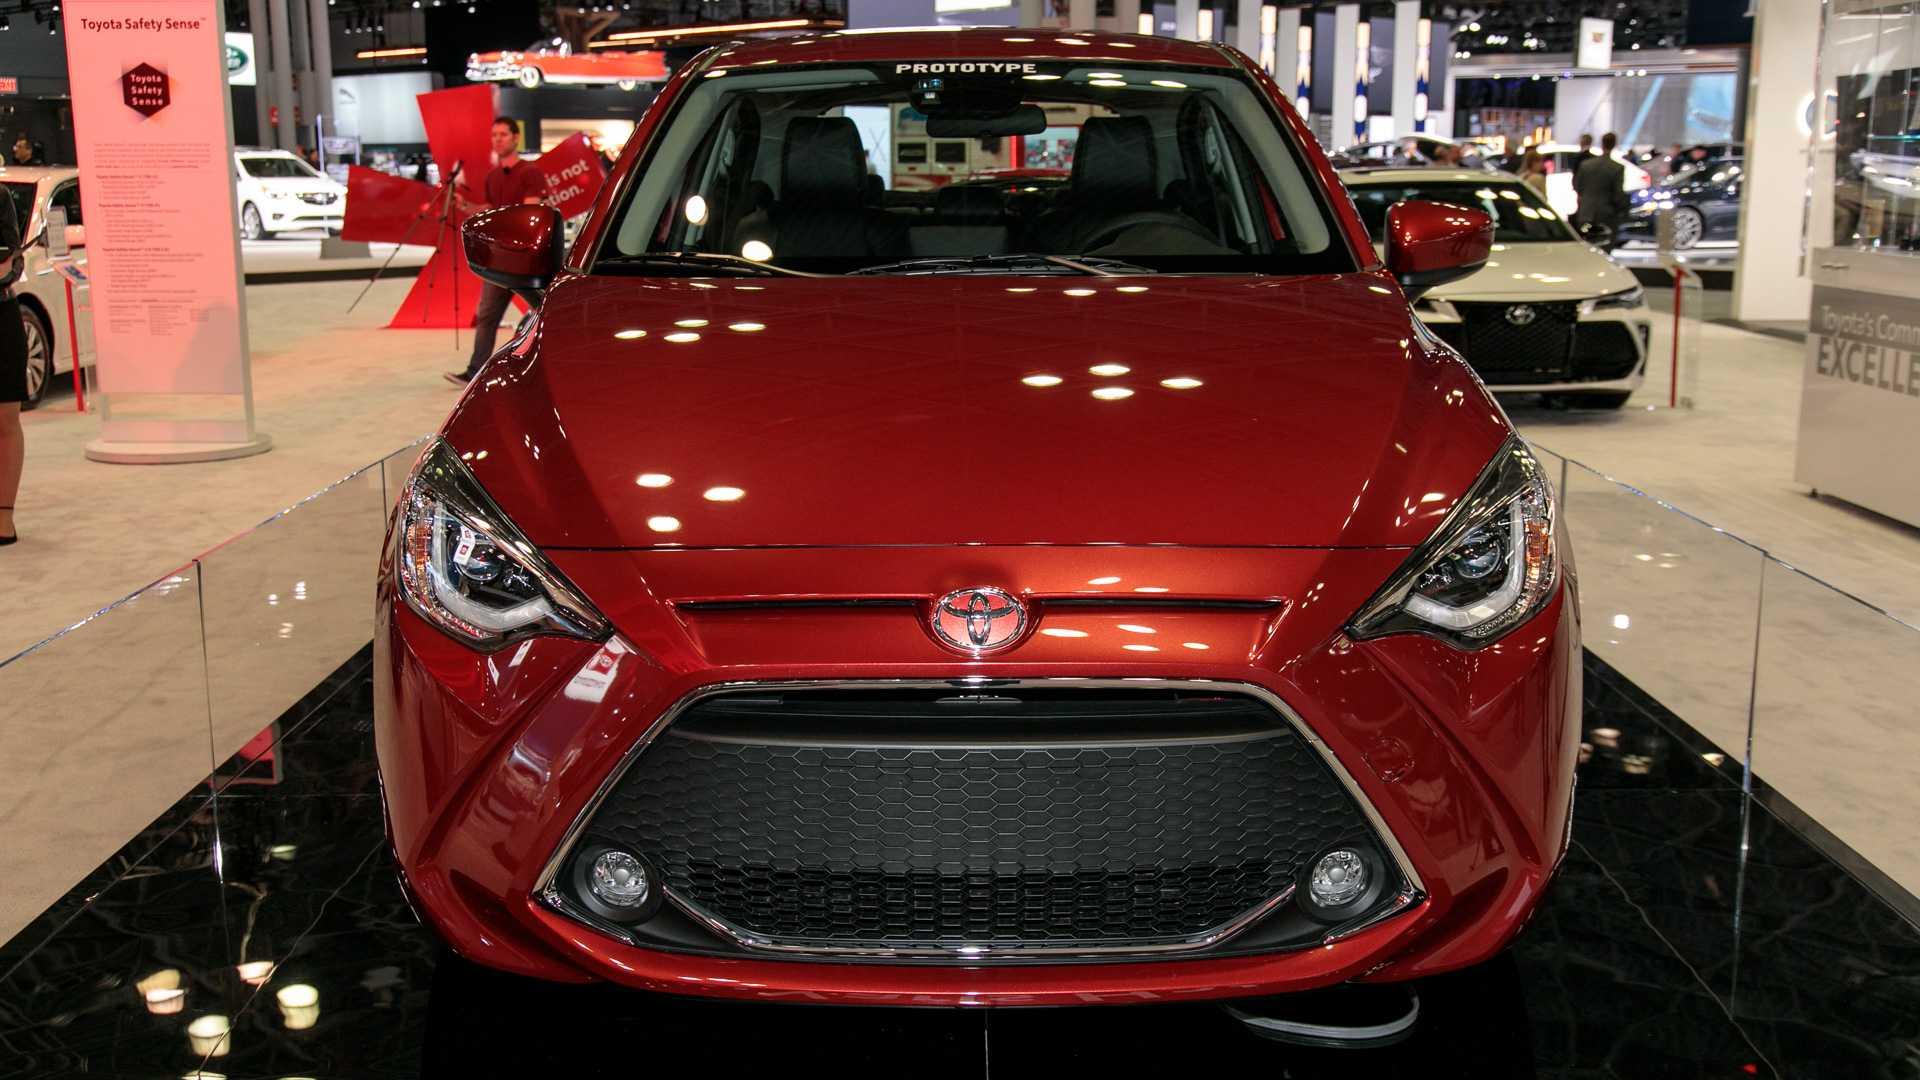 2020-toyota-yaris-hatchback-2.jpg